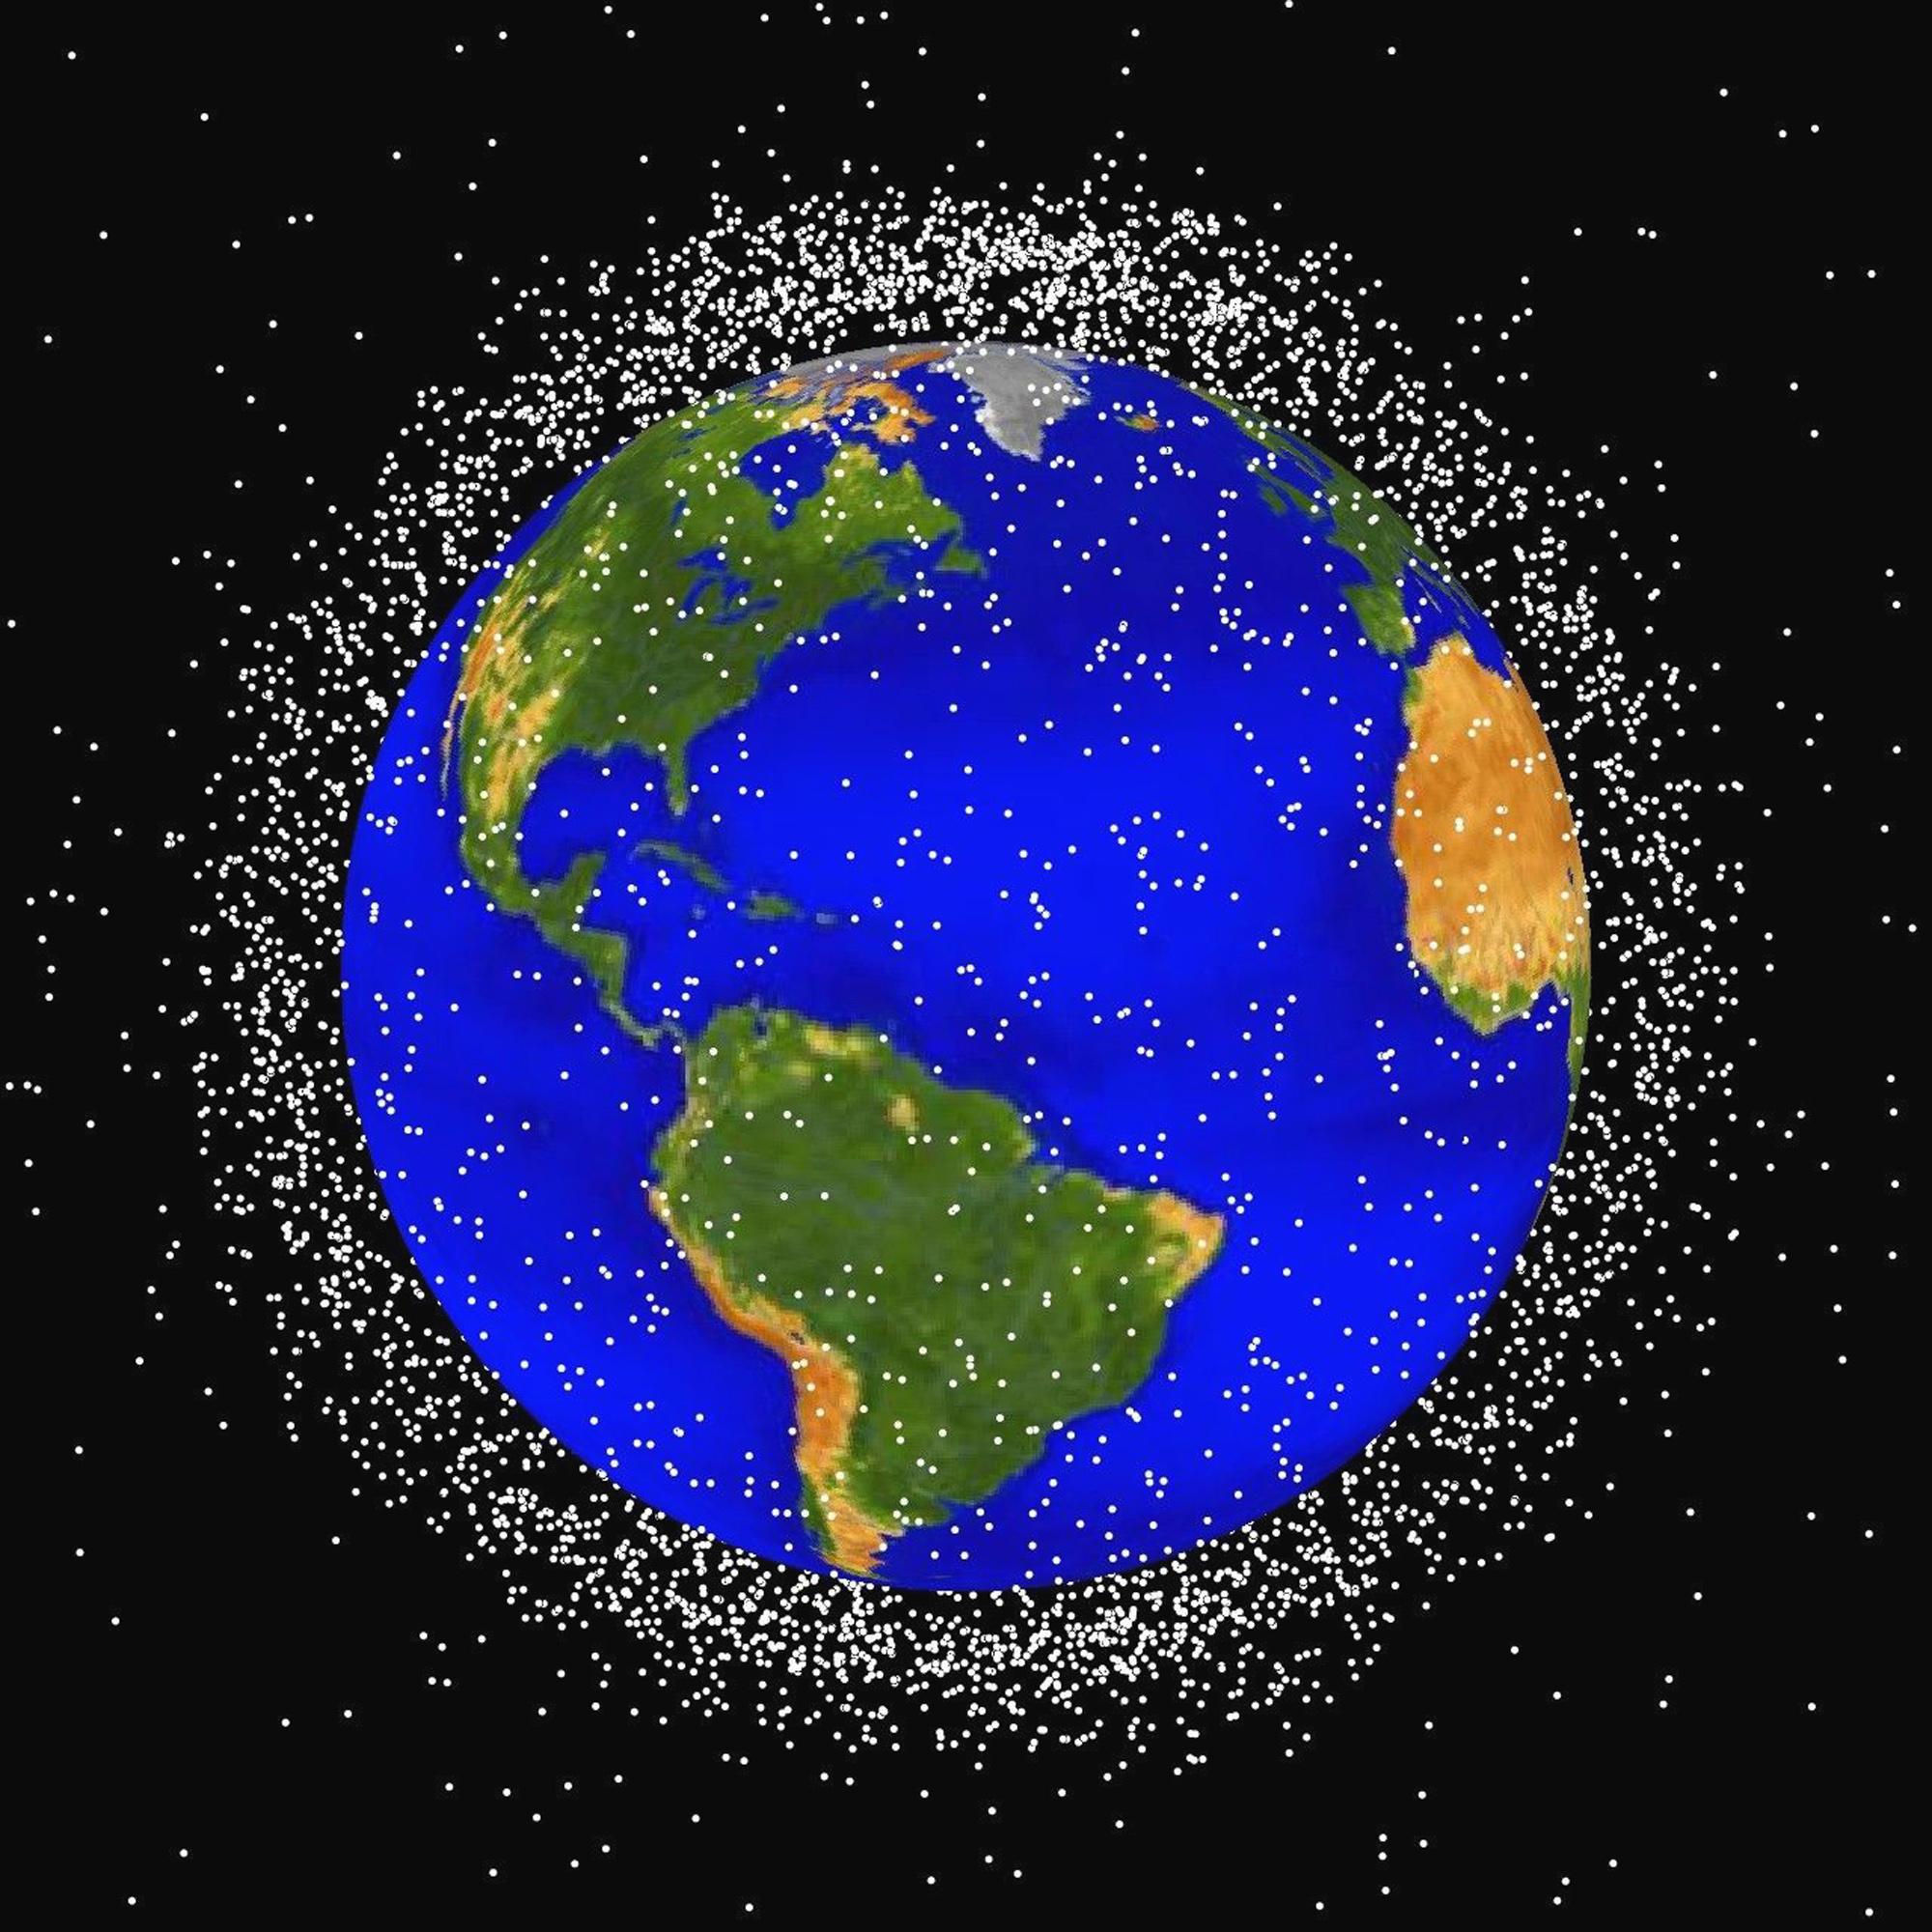 space science junk earth distant computer altitude km generated debis oblique vantage provide point